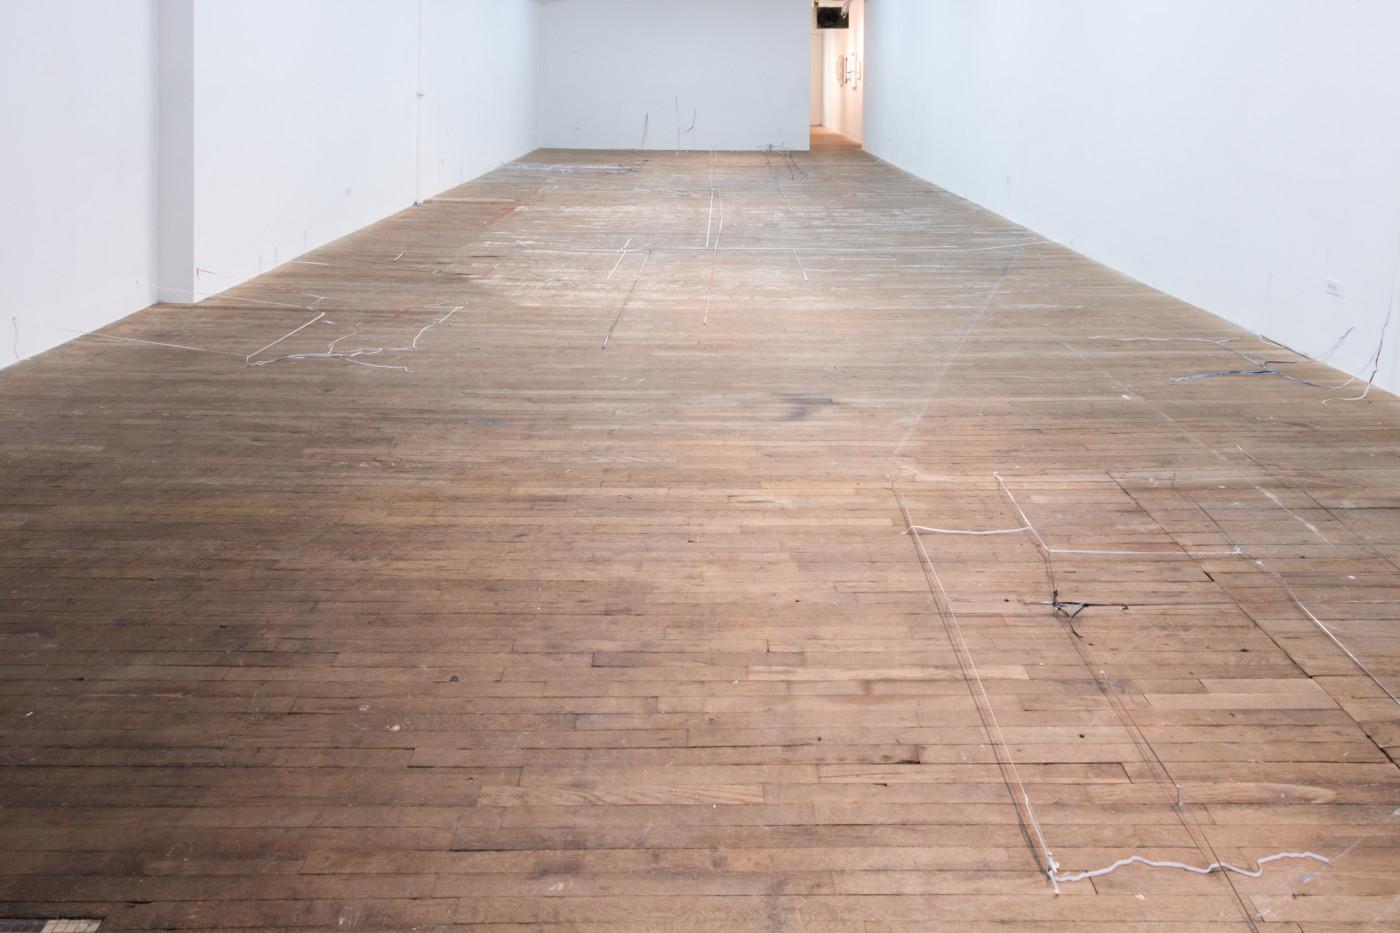 OLGA BALEMA  brain damage,  2019, Bridget Donahue, New York, USA, installation view - High Art Gallery Paris